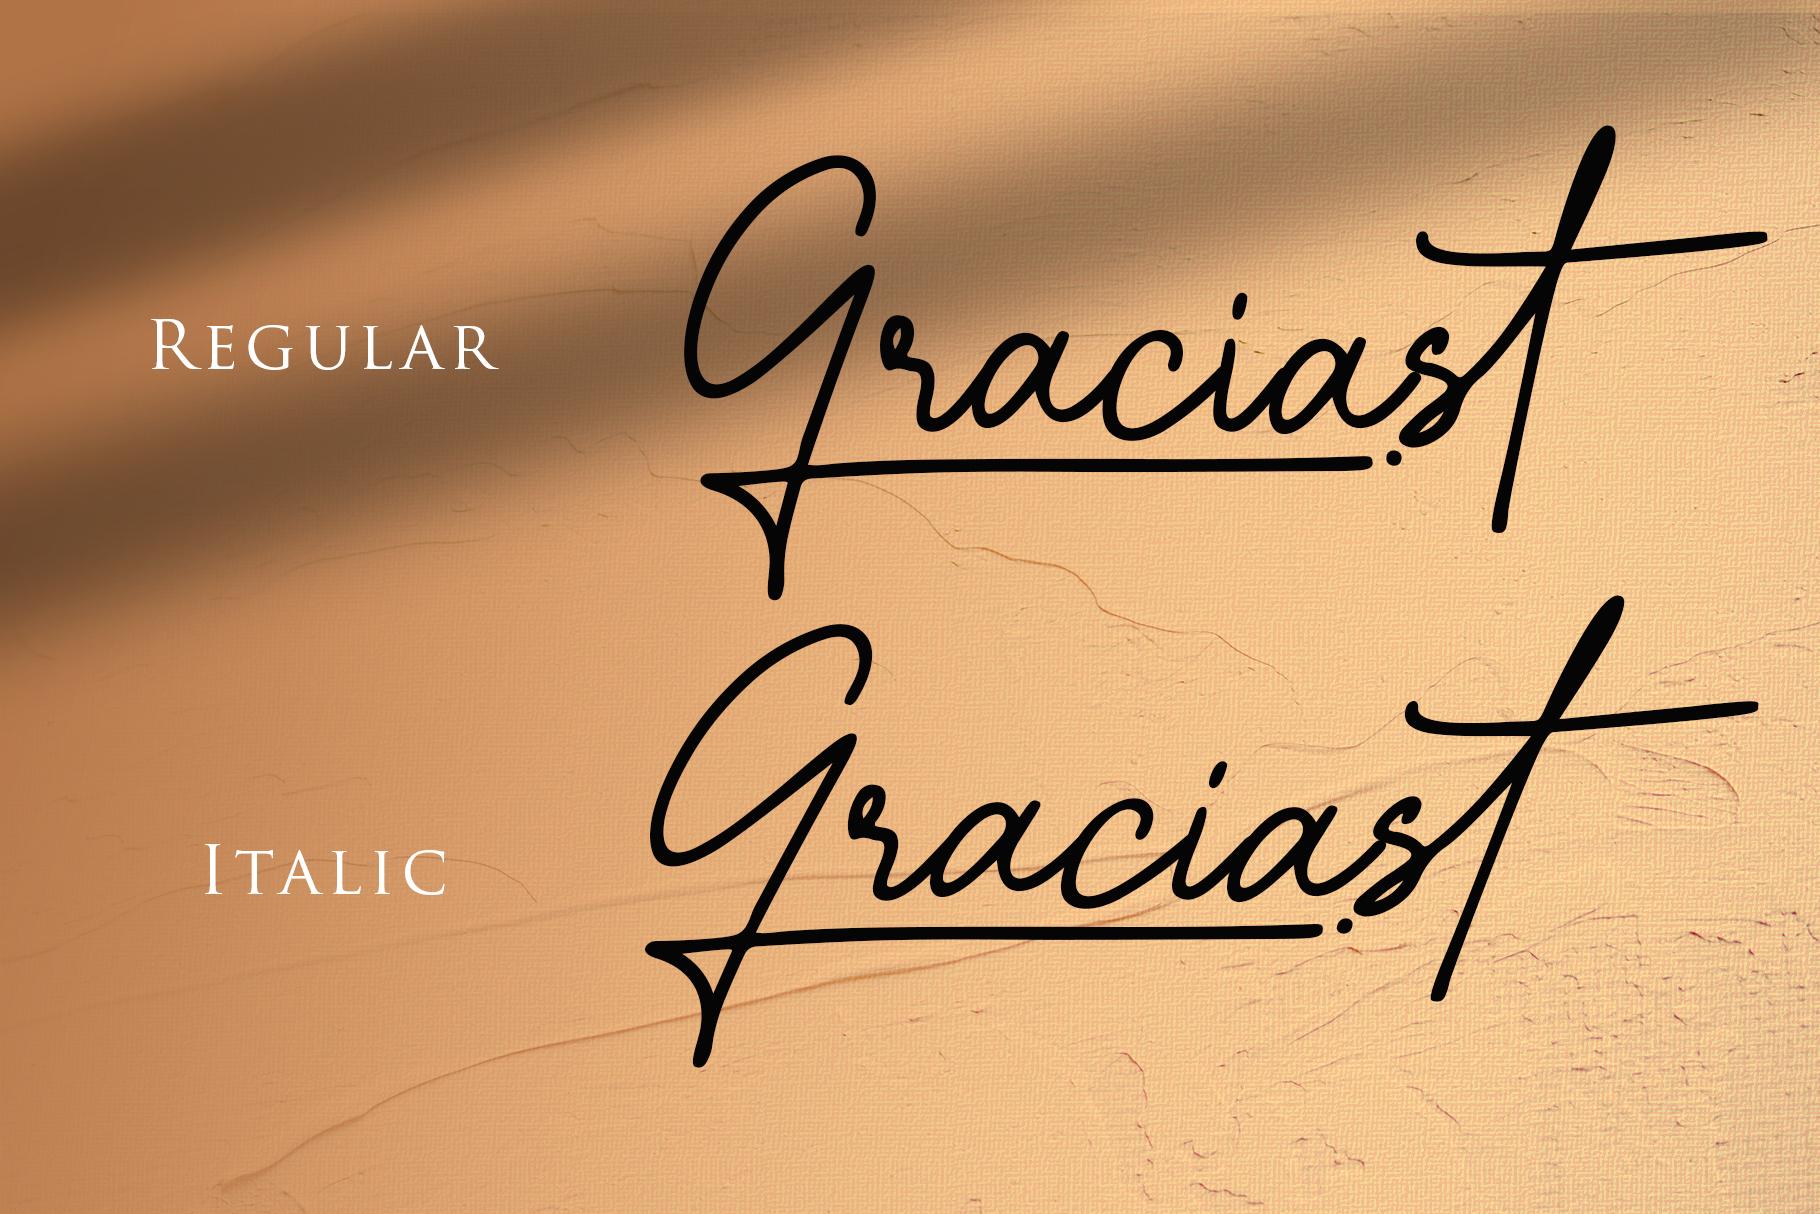 Graciast - Signature Font example image 2